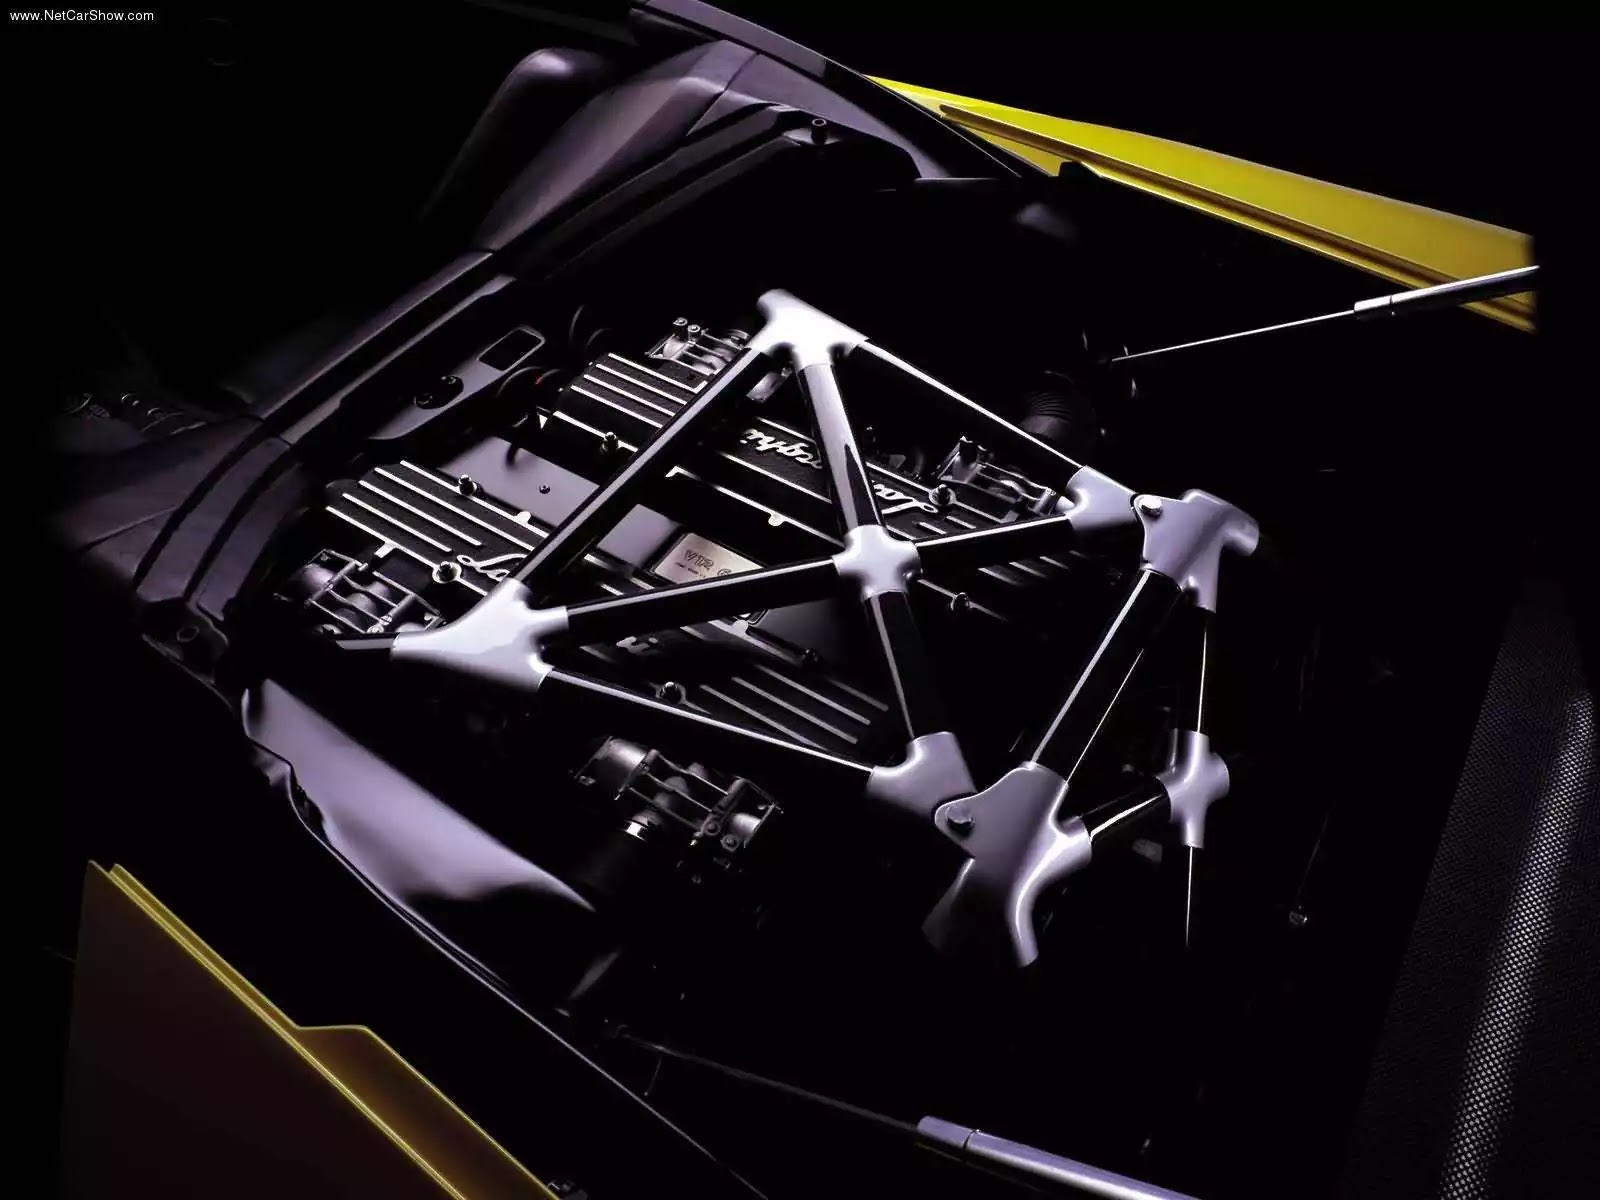 Hình ảnh siêu xe Lamborghini Murcielago Barchetta Concept 2002 & nội ngoại thất